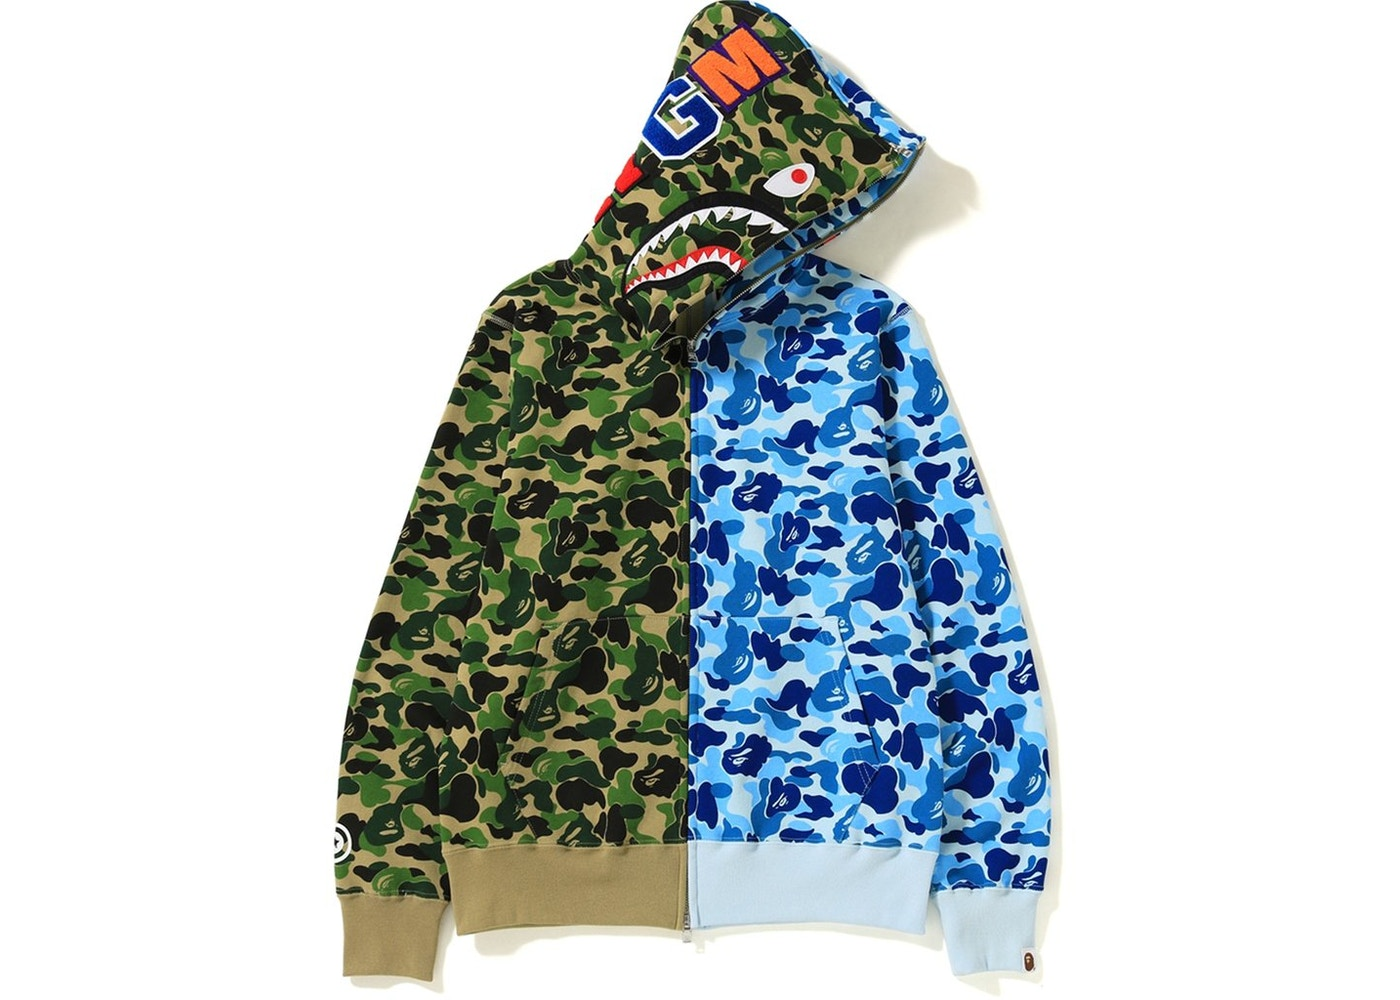 ca61497f88f0 Bape Tops Sweatshirts - Buy   Sell Streetwear